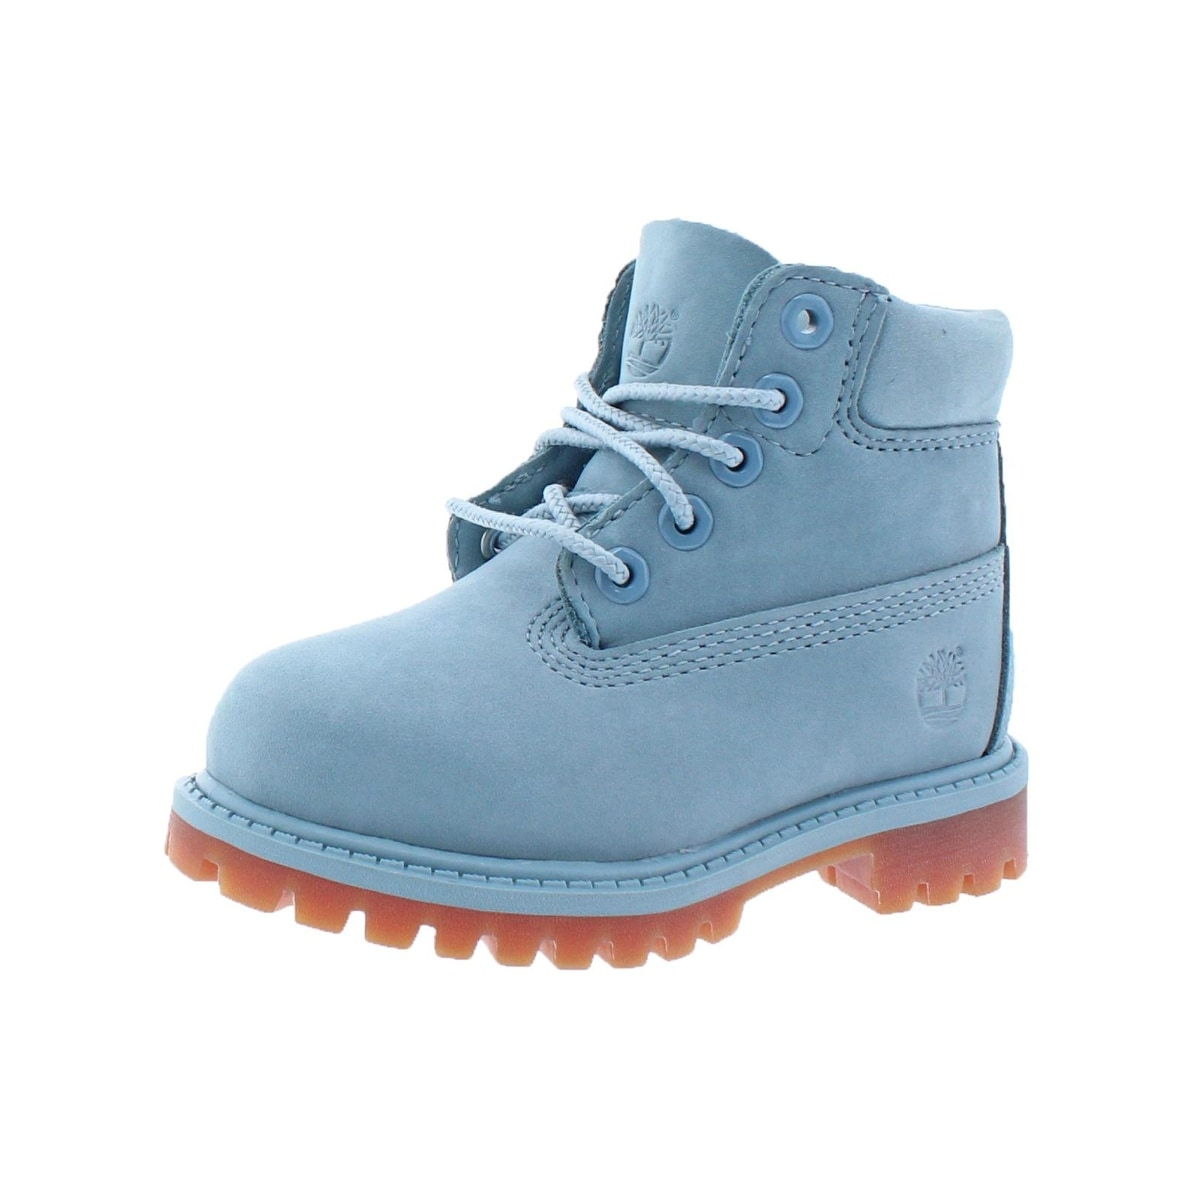 27a06c54252 Timberland Girls 6in Premium Ankle Boots Toddler Waterproof - 6 medium  (b,m) toddler